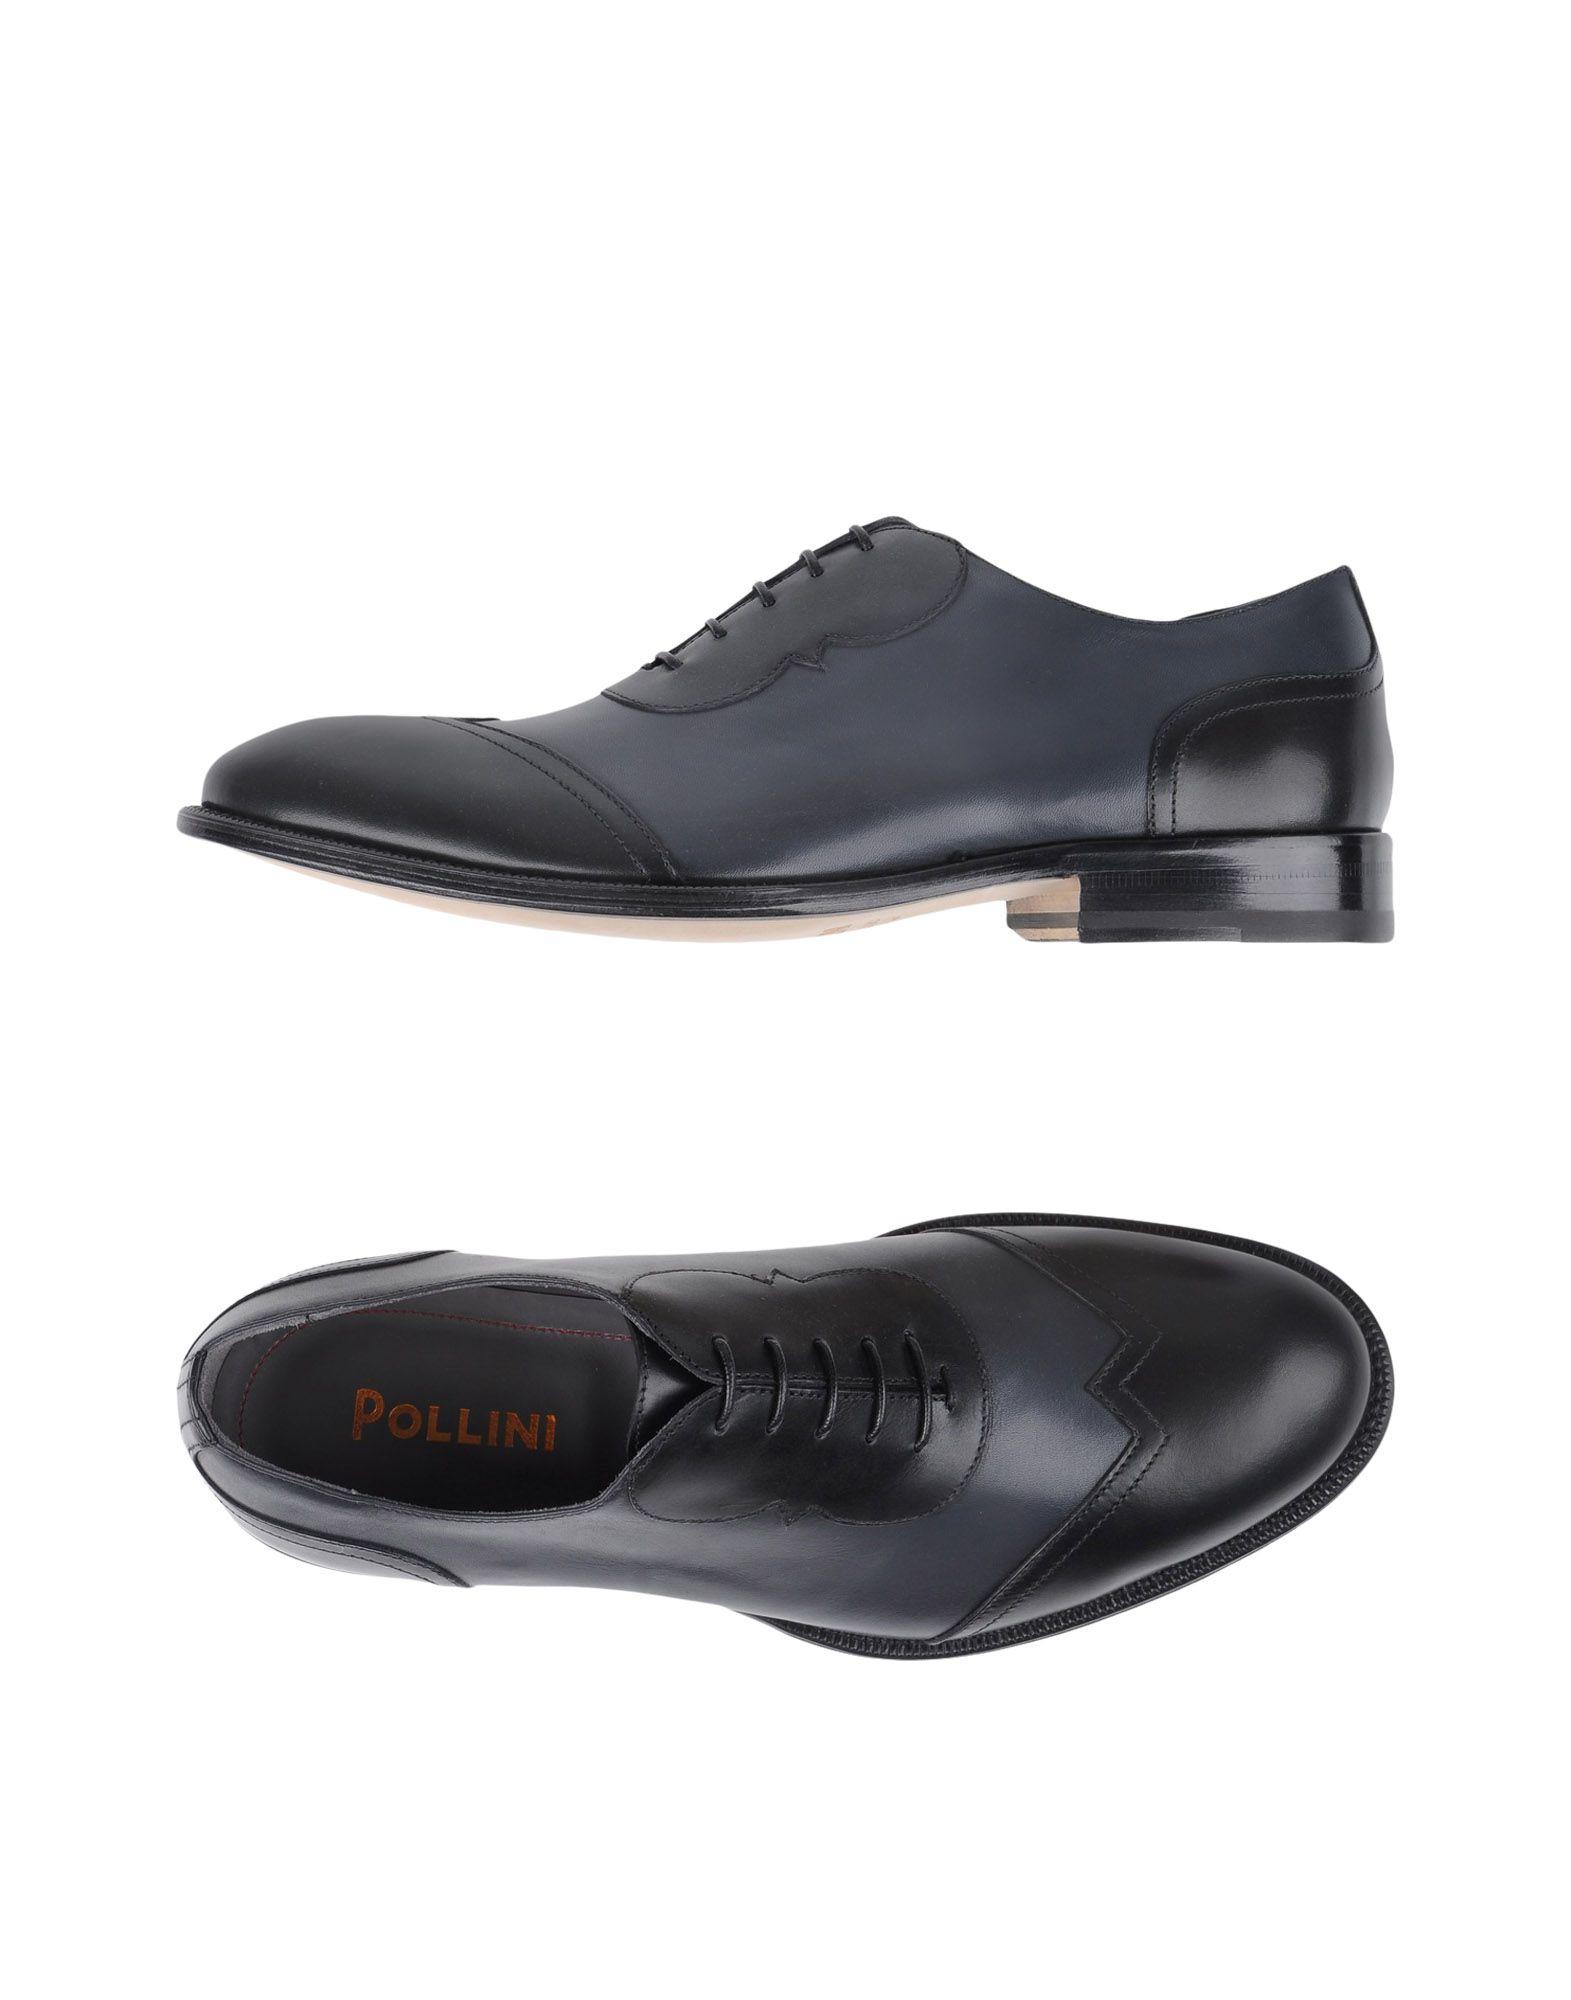 Pollini Heiße Schnürschuhe Herren  11331424TP Heiße Pollini Schuhe 89712a